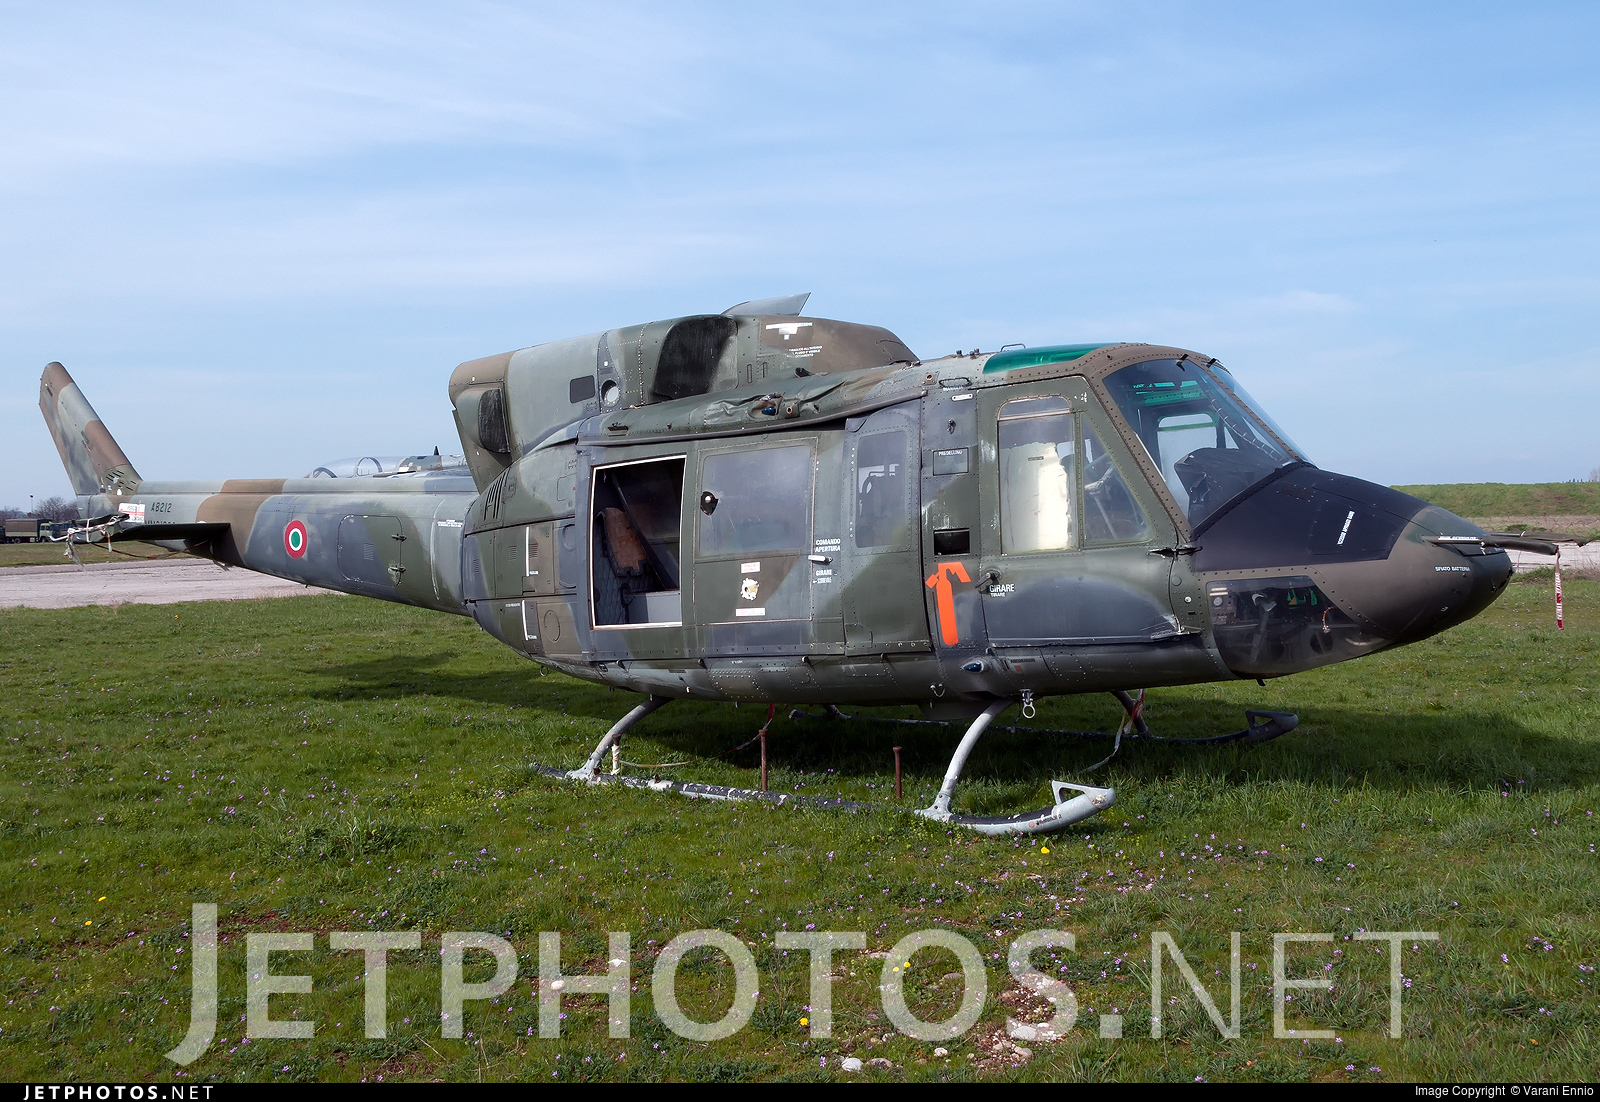 MM81208 - Agusta-Bell AB-212AM - Italy - Air Force